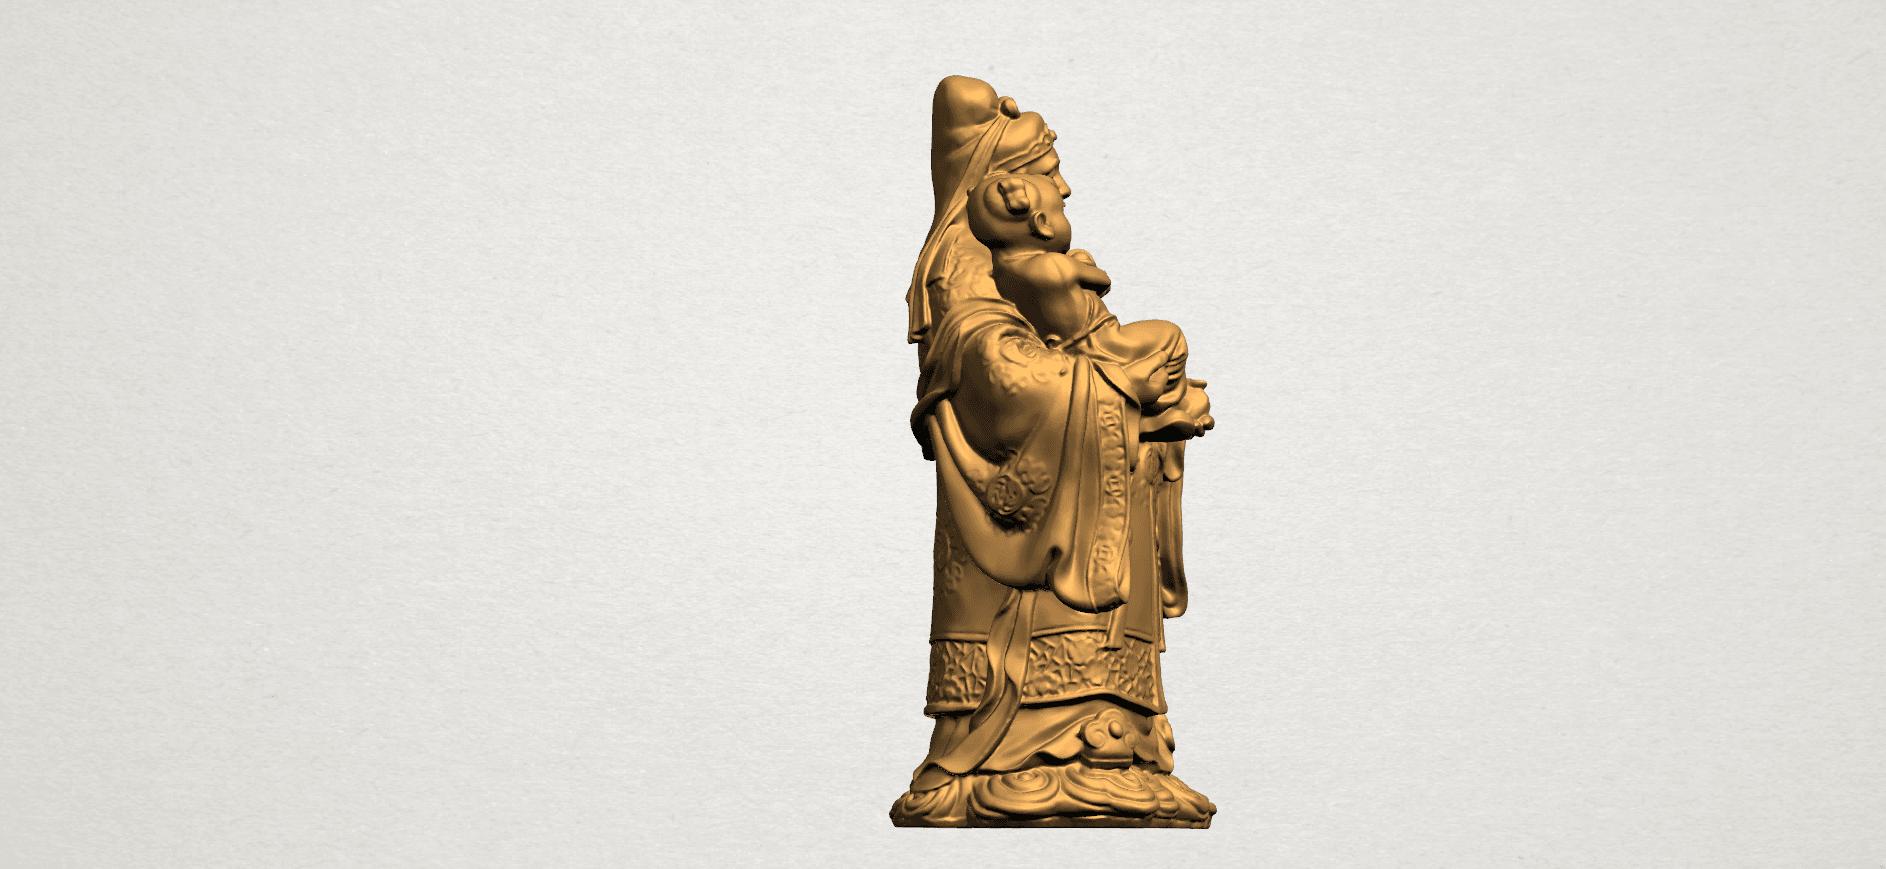 Fook (Fook Look Sao) 80mm - A06.png Download free STL file Fook (Fook Look Sao) • 3D printer template, GeorgesNikkei